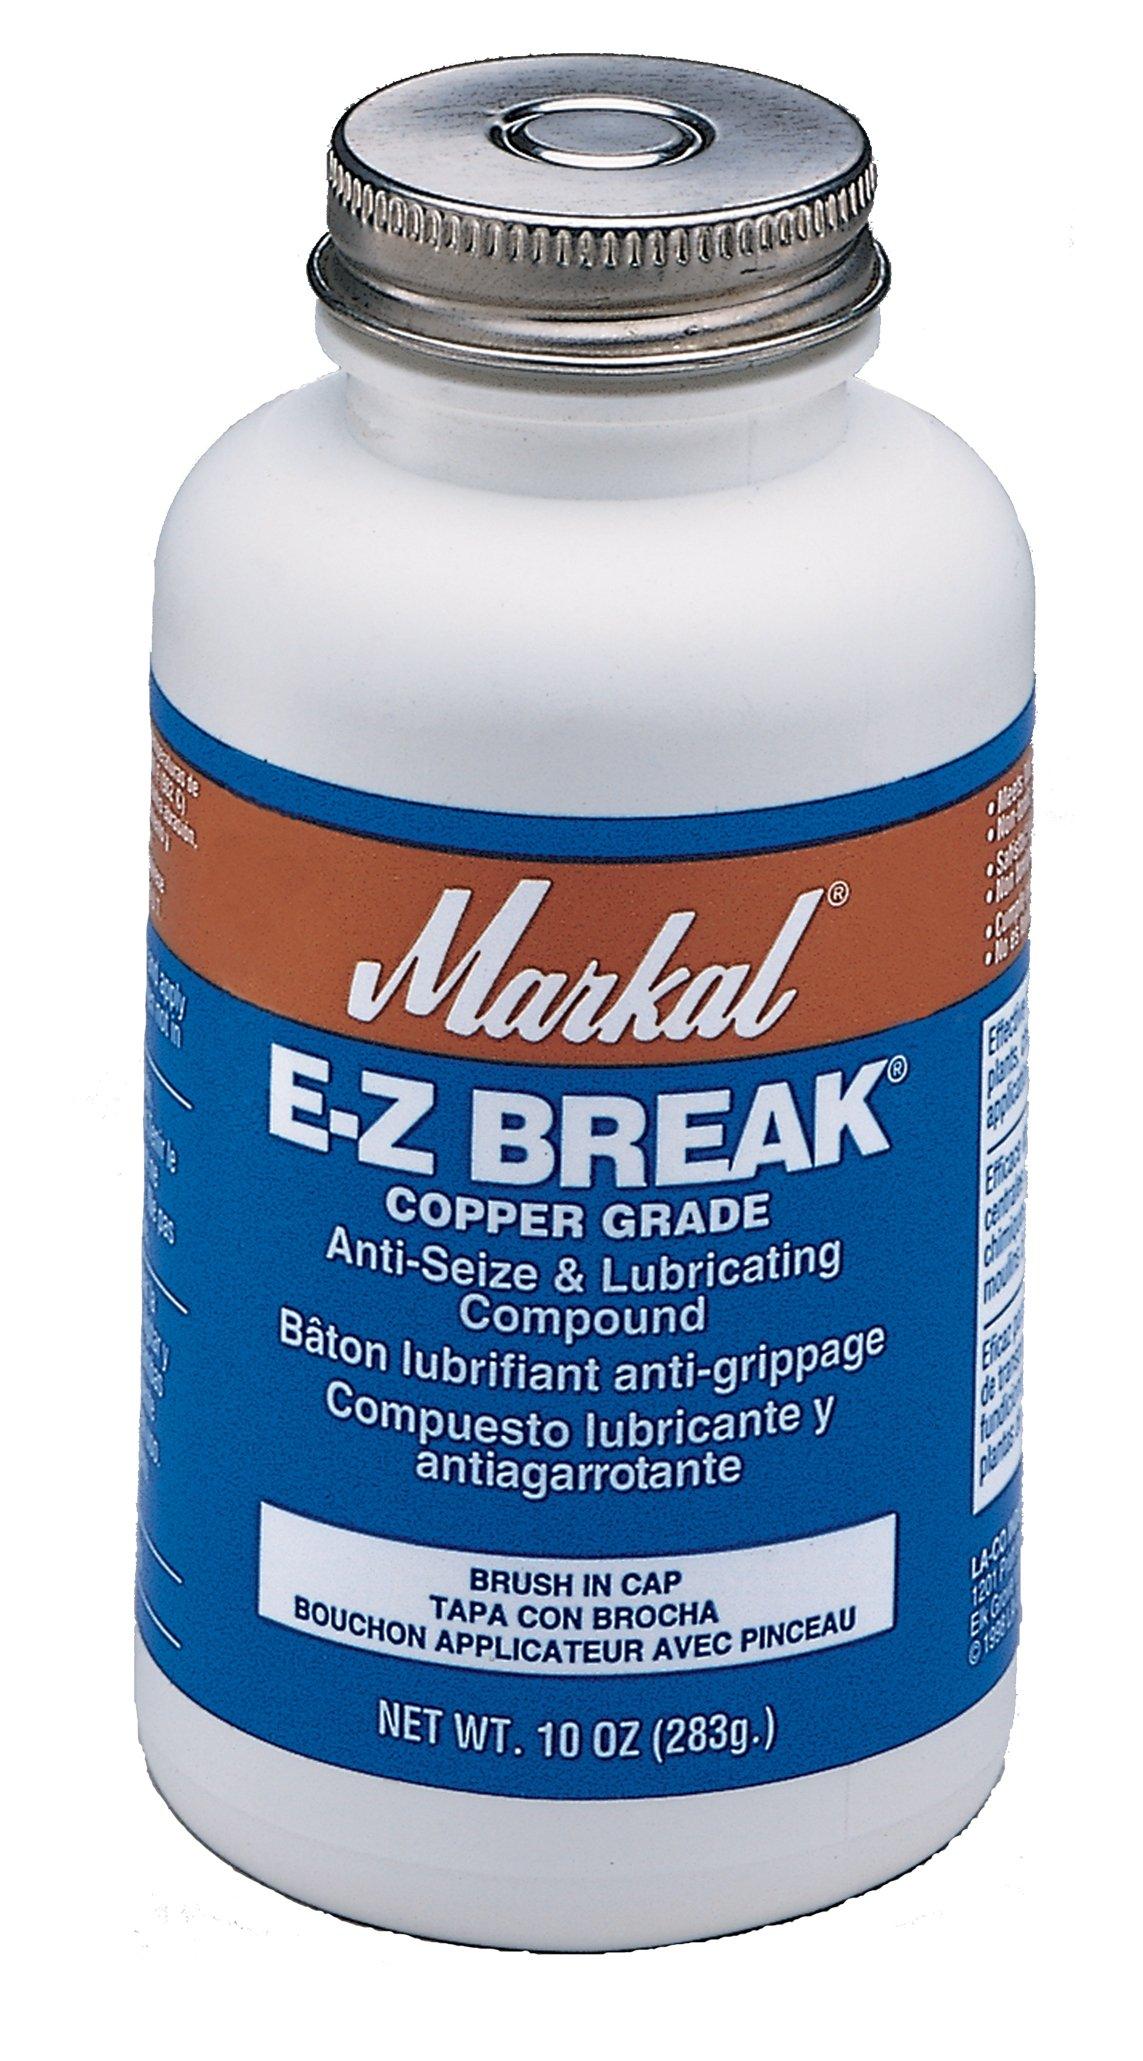 Markal EZ Break Copper Grade Antiseize Paste, 1800 Degree F Temperature, 425 lbs by Markal